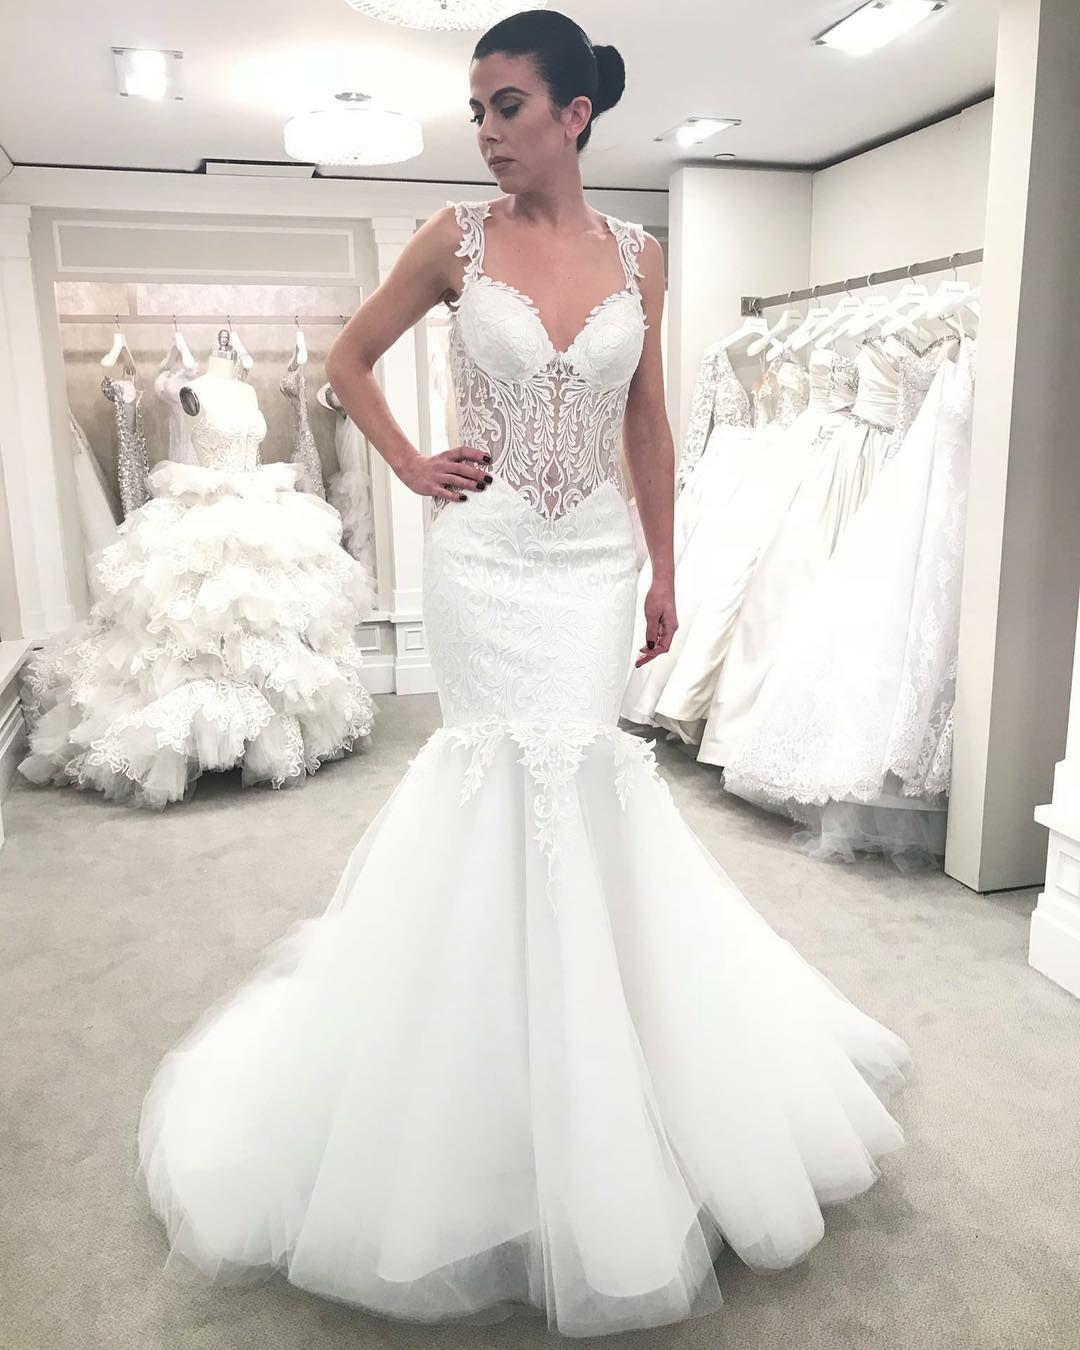 This Gorgeous Pninatornai Style 4653 Is Available At Kleinfeld Pninatornai Regra Kleinfeld Bridal Pnina Tornai Wedding Dress Ball Gown Wedding Dress [ 1350 x 1080 Pixel ]